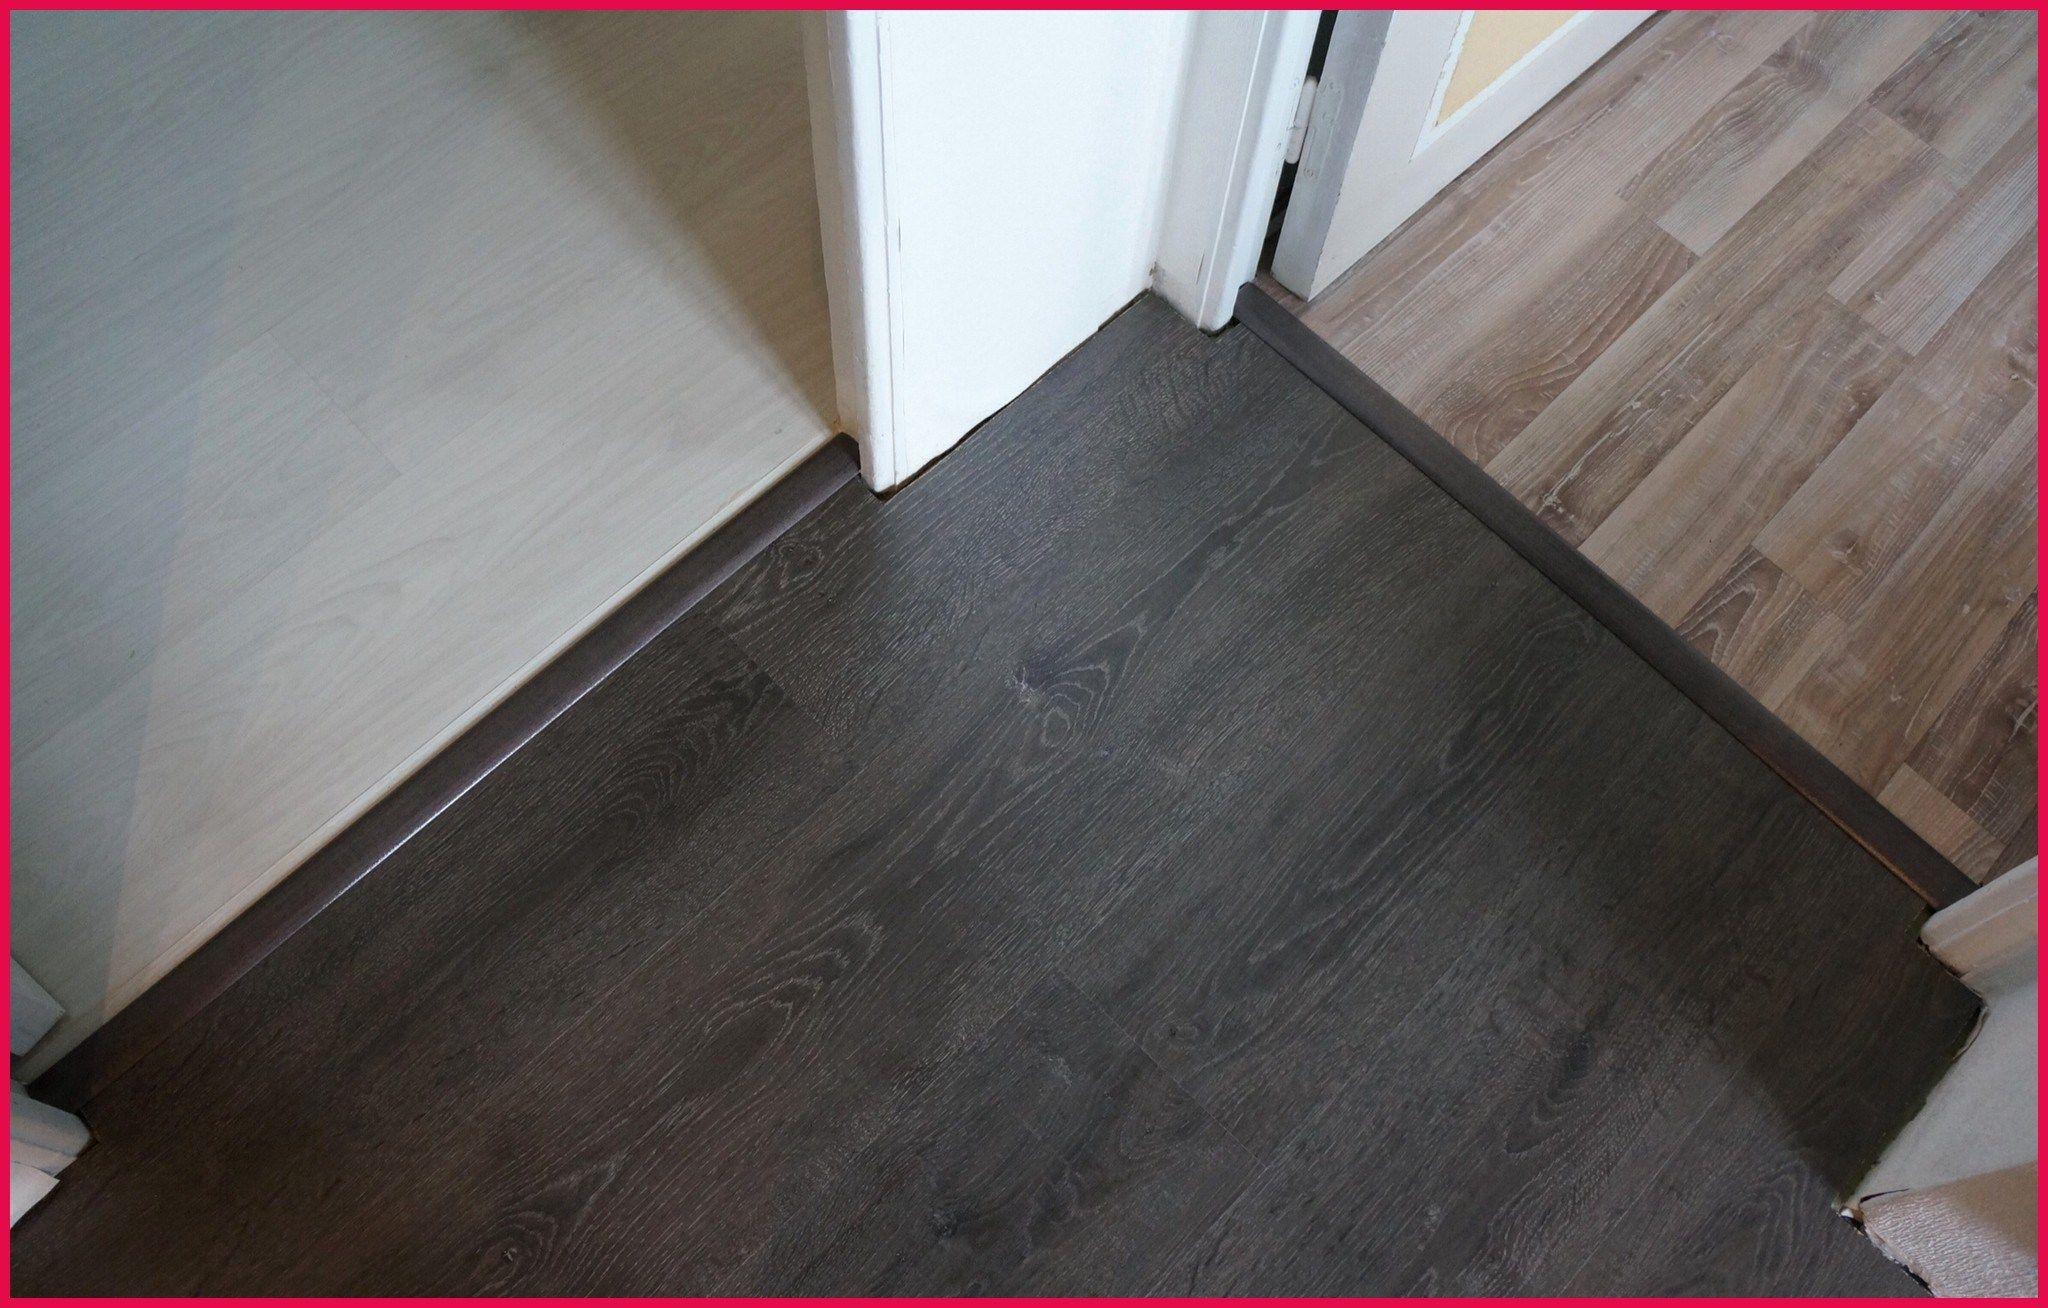 Best Of Pose Barre De Seuil Parquet Flottant Hardwood Floors Flooring Hardwood